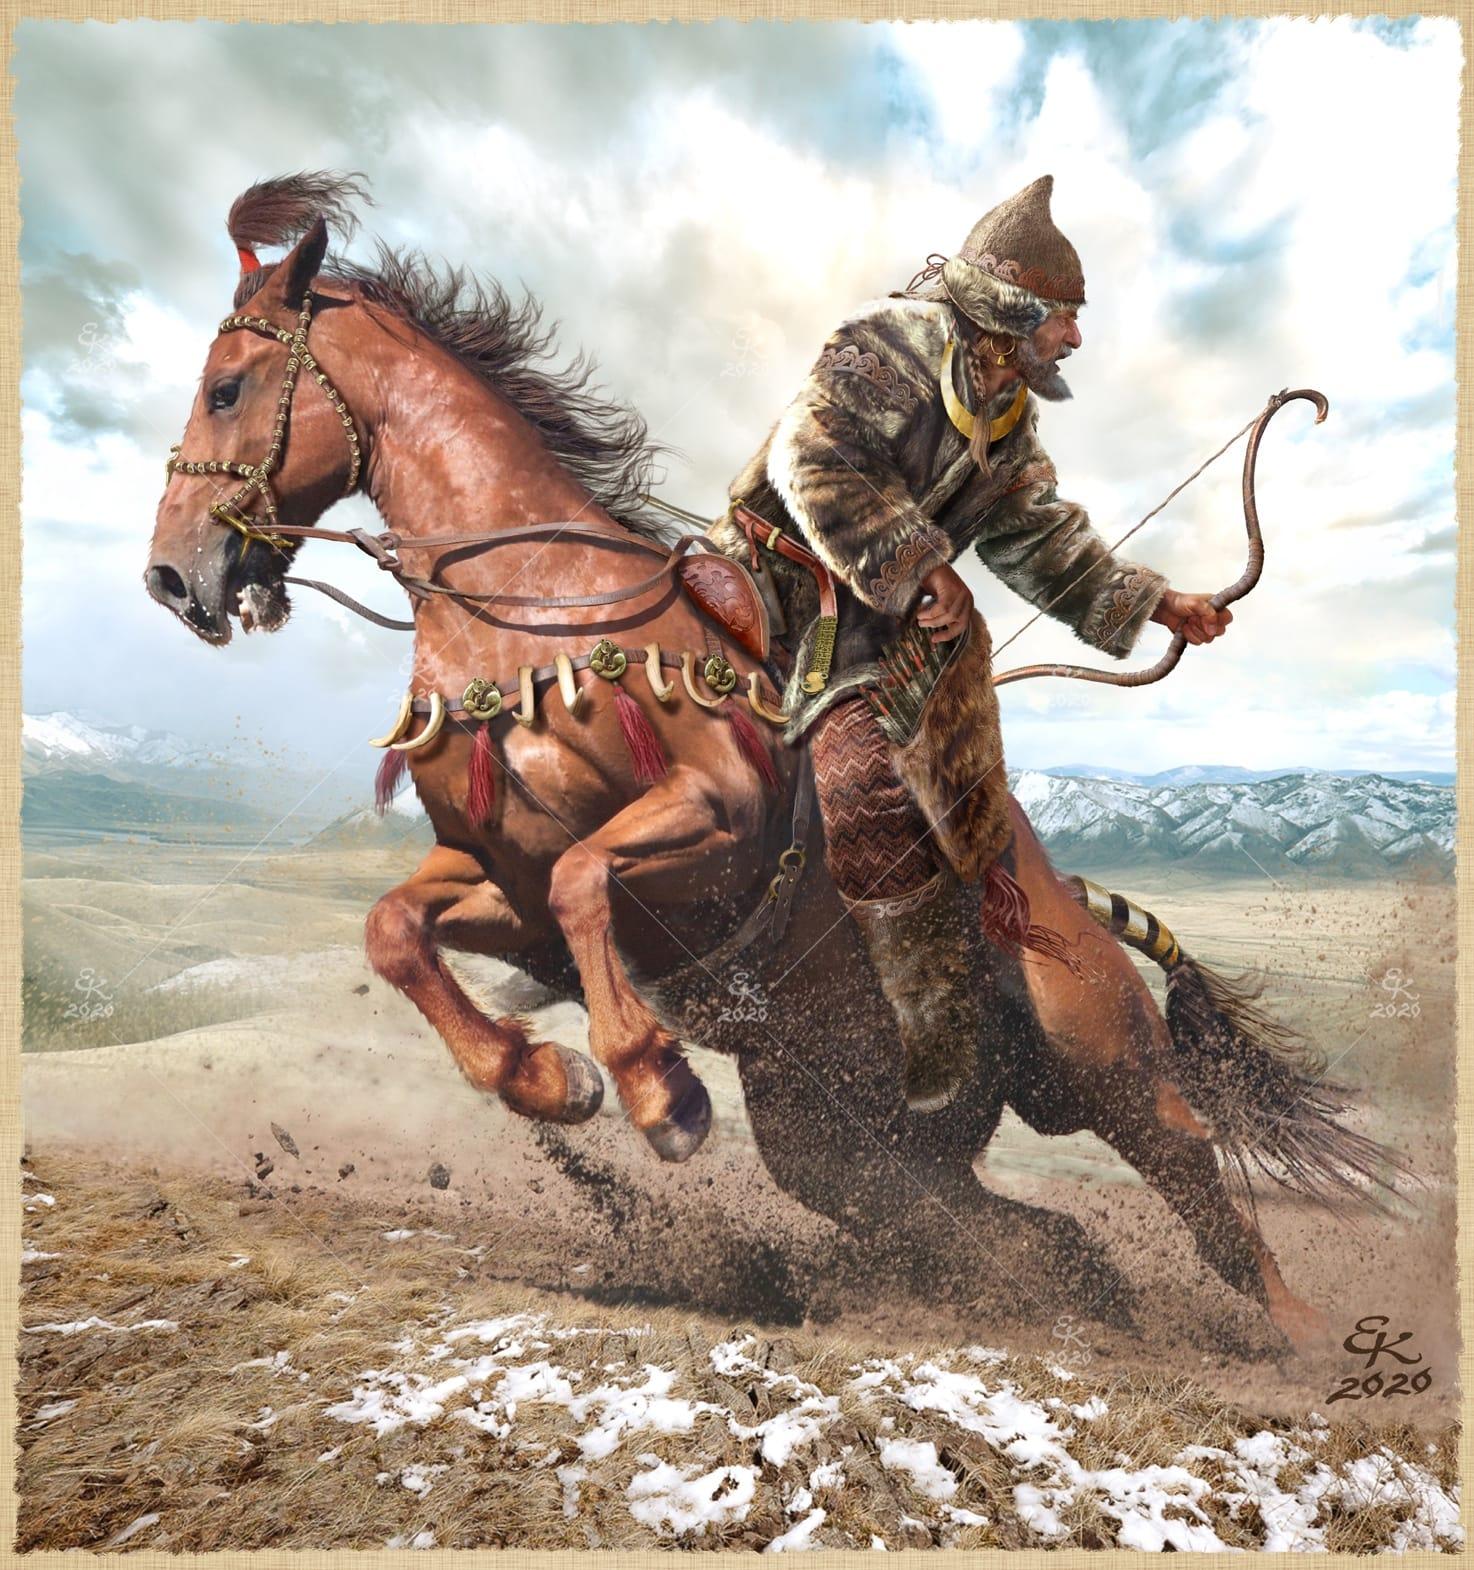 Евгений Край. Скиф. Алтай. VIII-VII век до н.э.